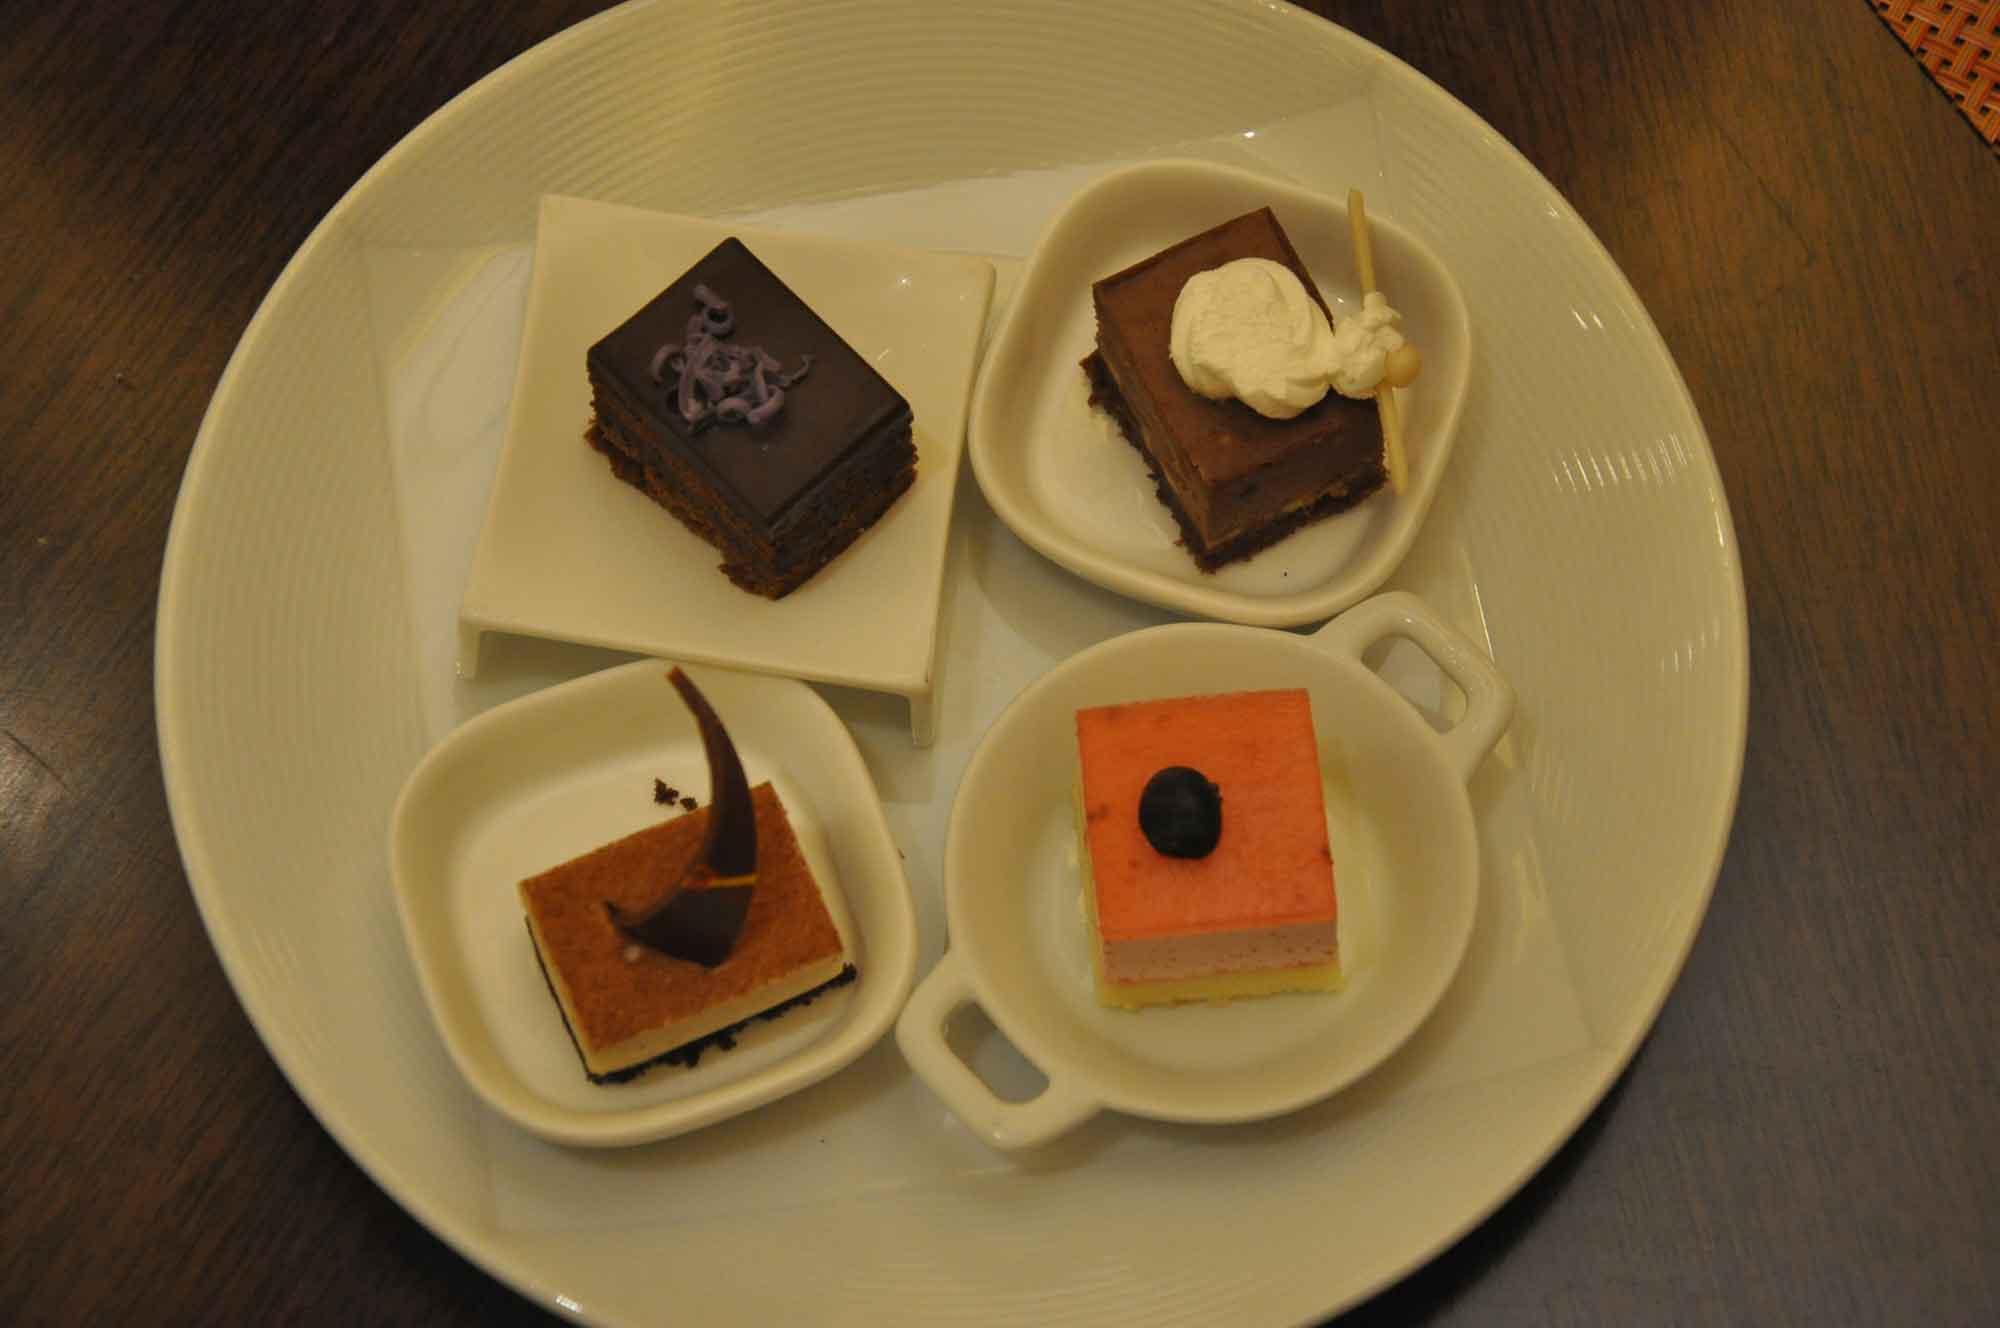 Grand Orbit Macau desserts